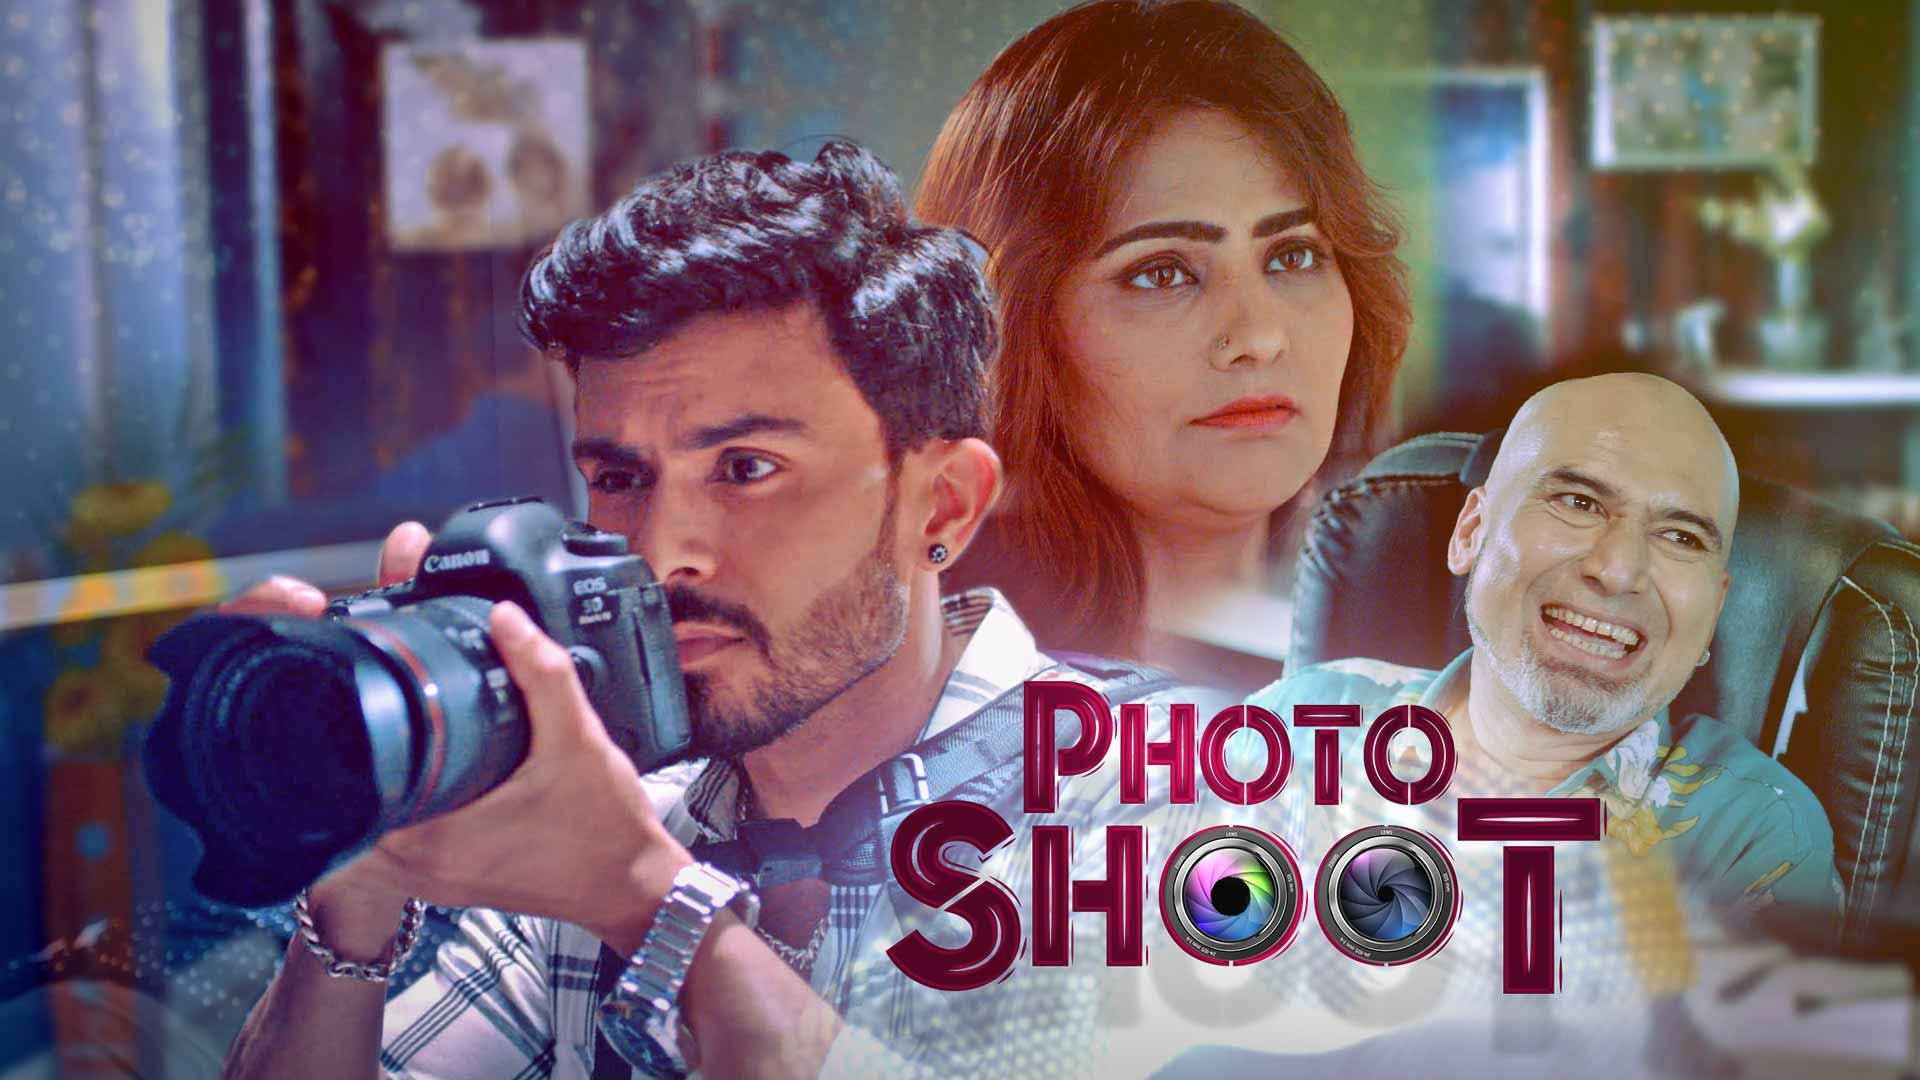 Photoshoot 2021 S01 Hindi Kooku App Original Web Series Official Trailer 1080p HDRip Download